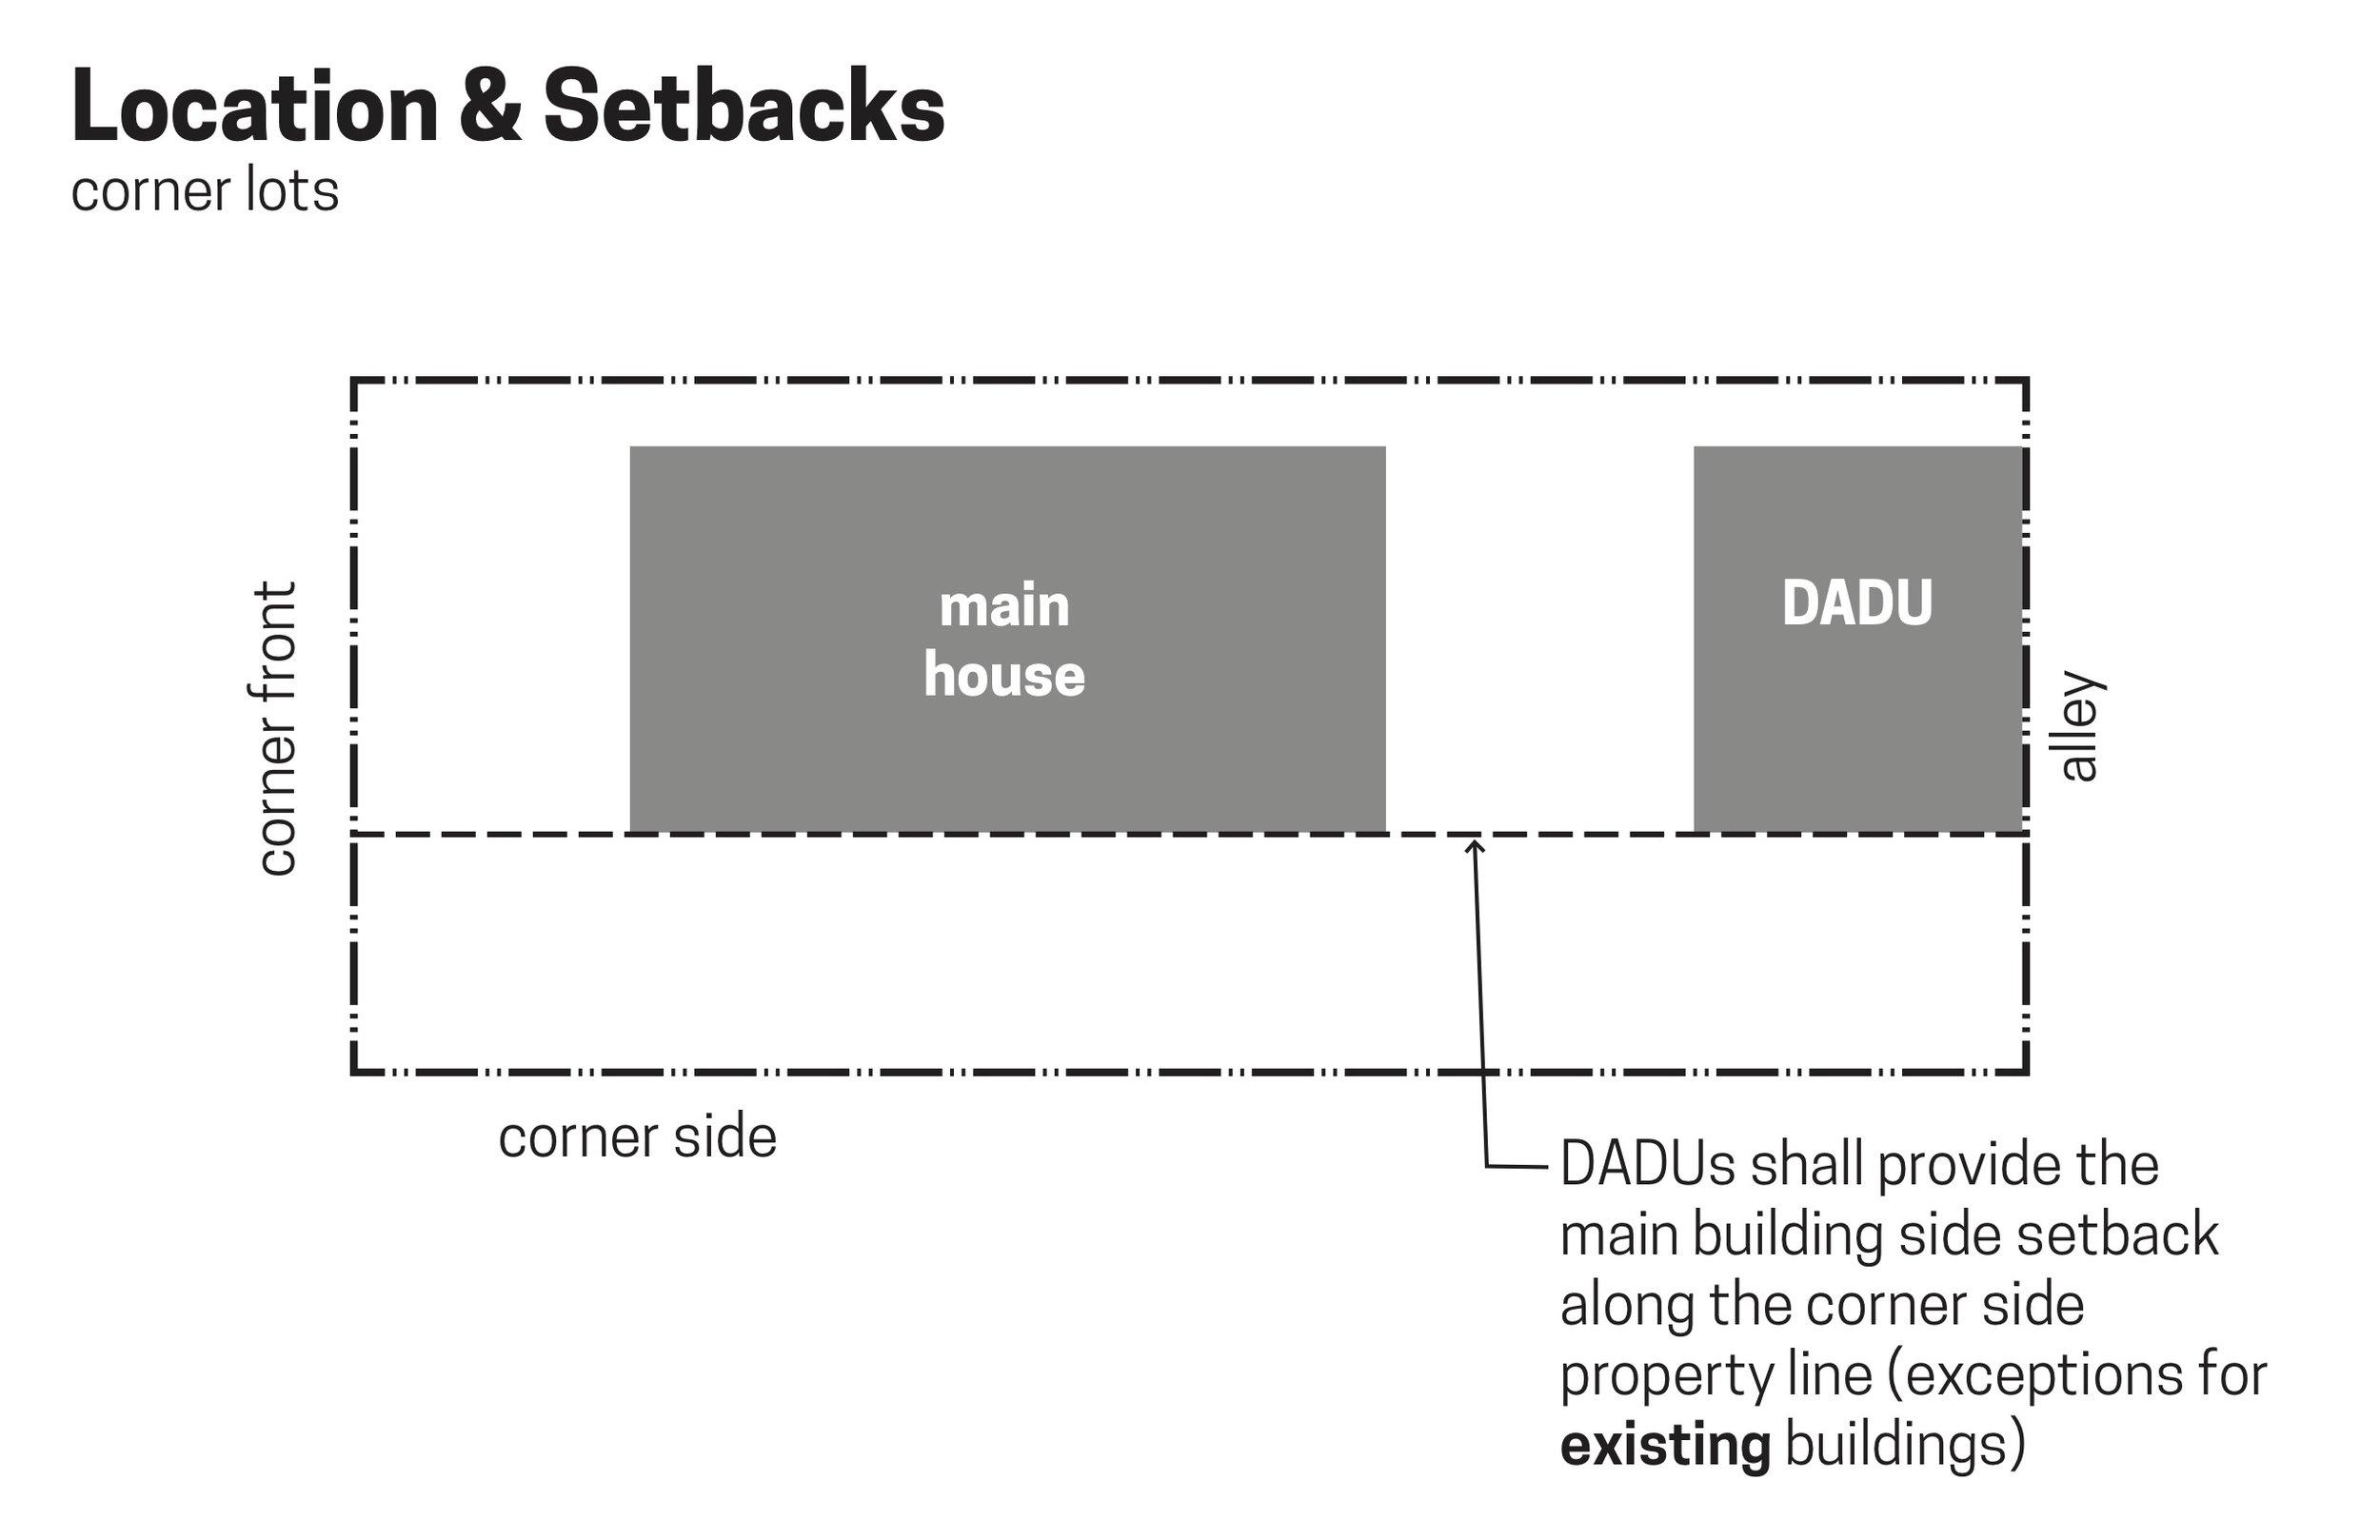 wc-studio-DADU-location-setbacks-corner-lot.jpg